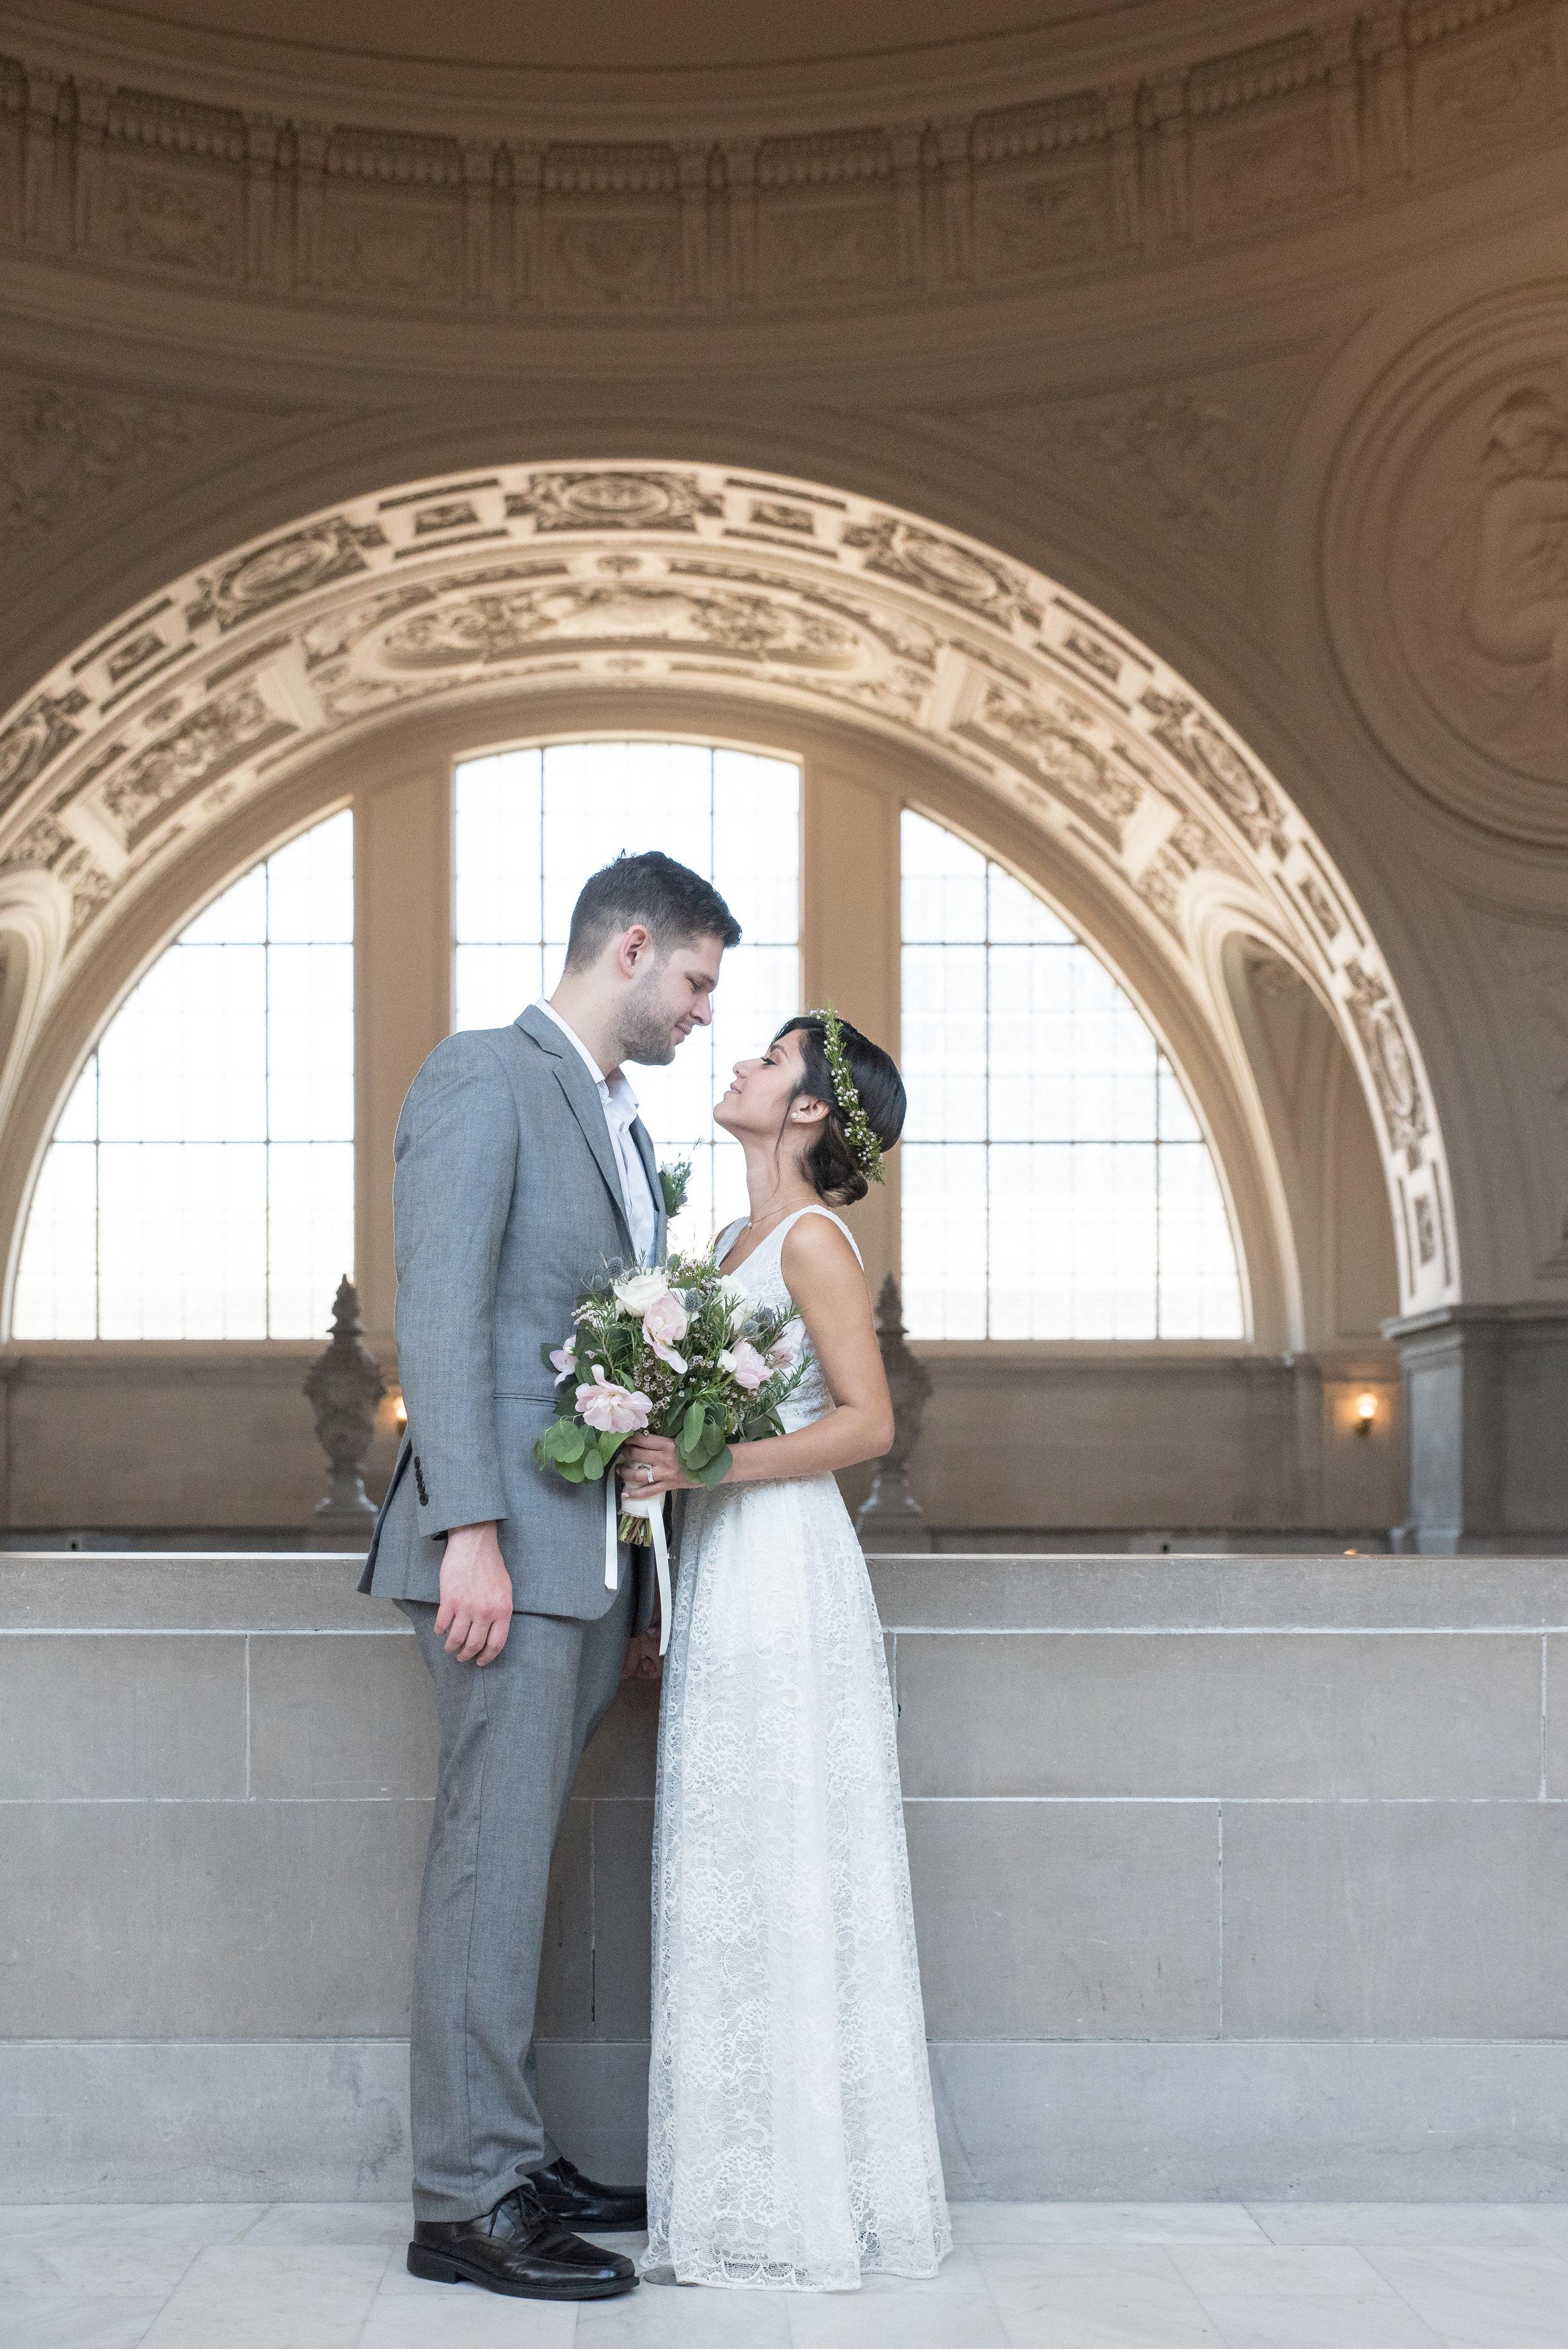 WeddingMikeGabriela_KJB0904-Edit.jpg